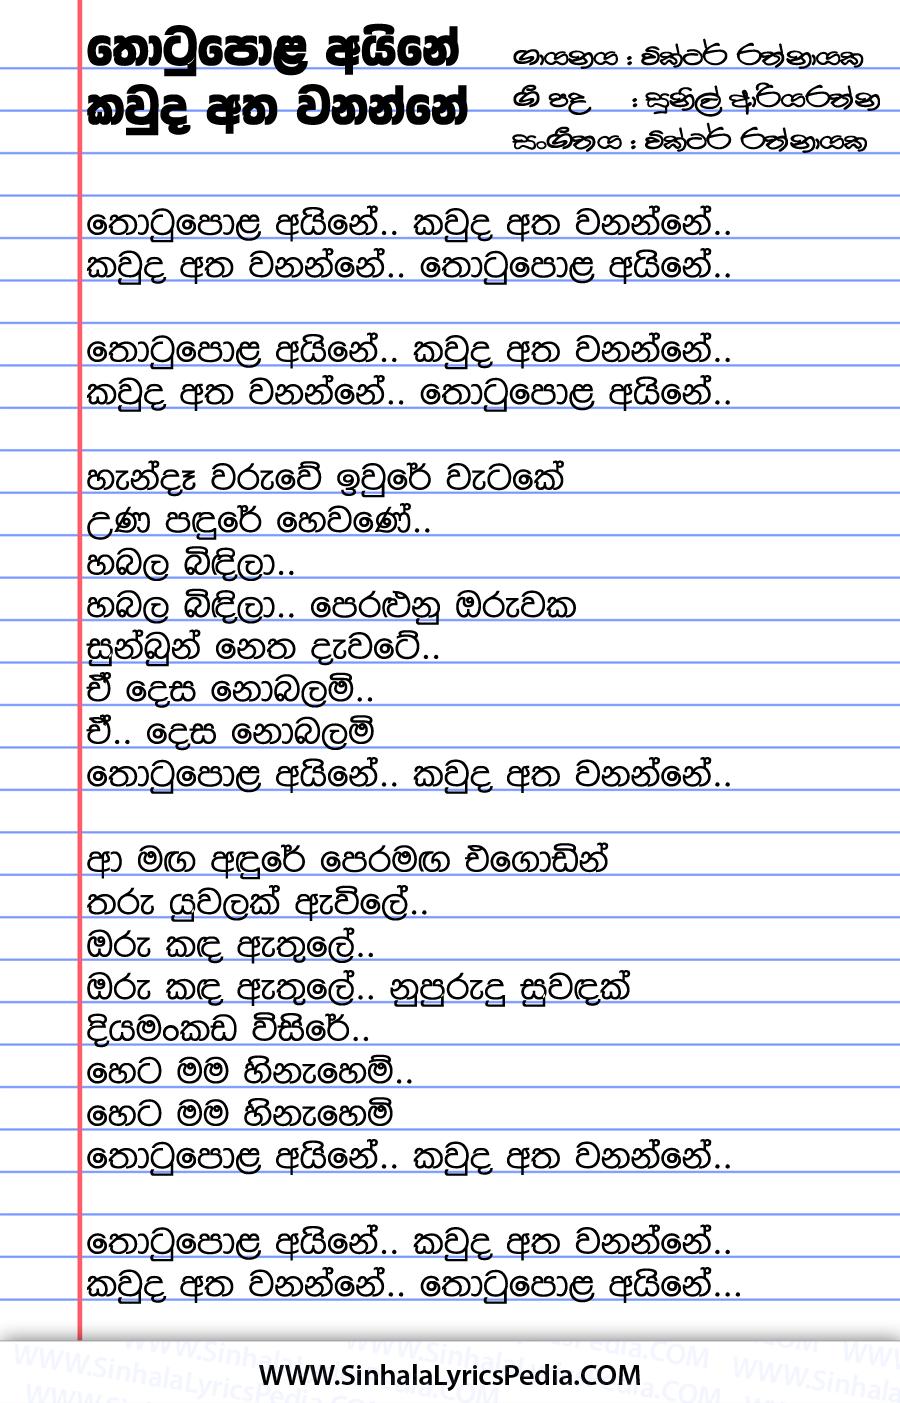 Thotupola Aine Kauda Atha Wanane Song Lyrics